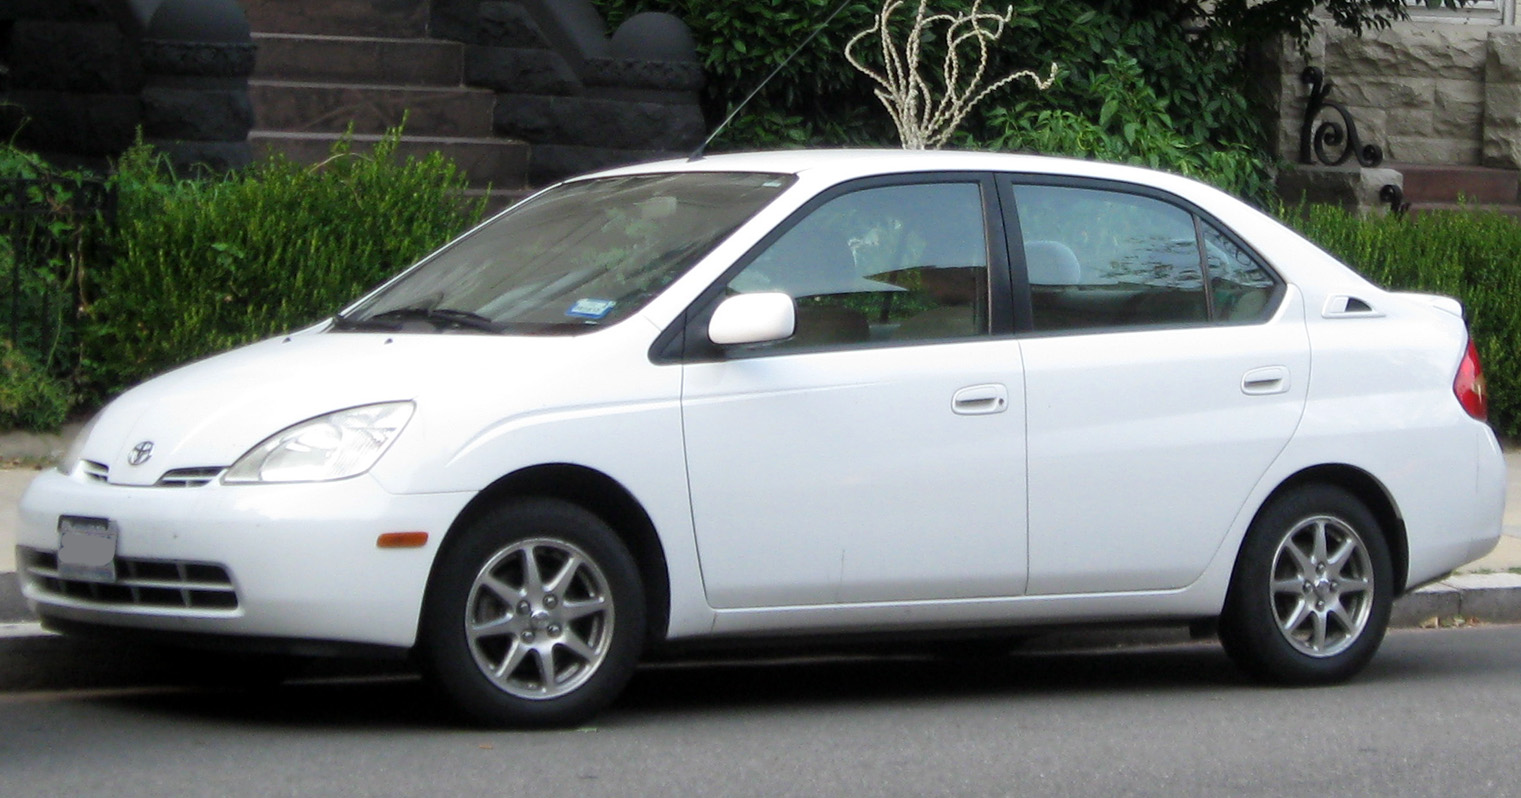 1st_Toyota_Prius_--_07-28-2011.jpg